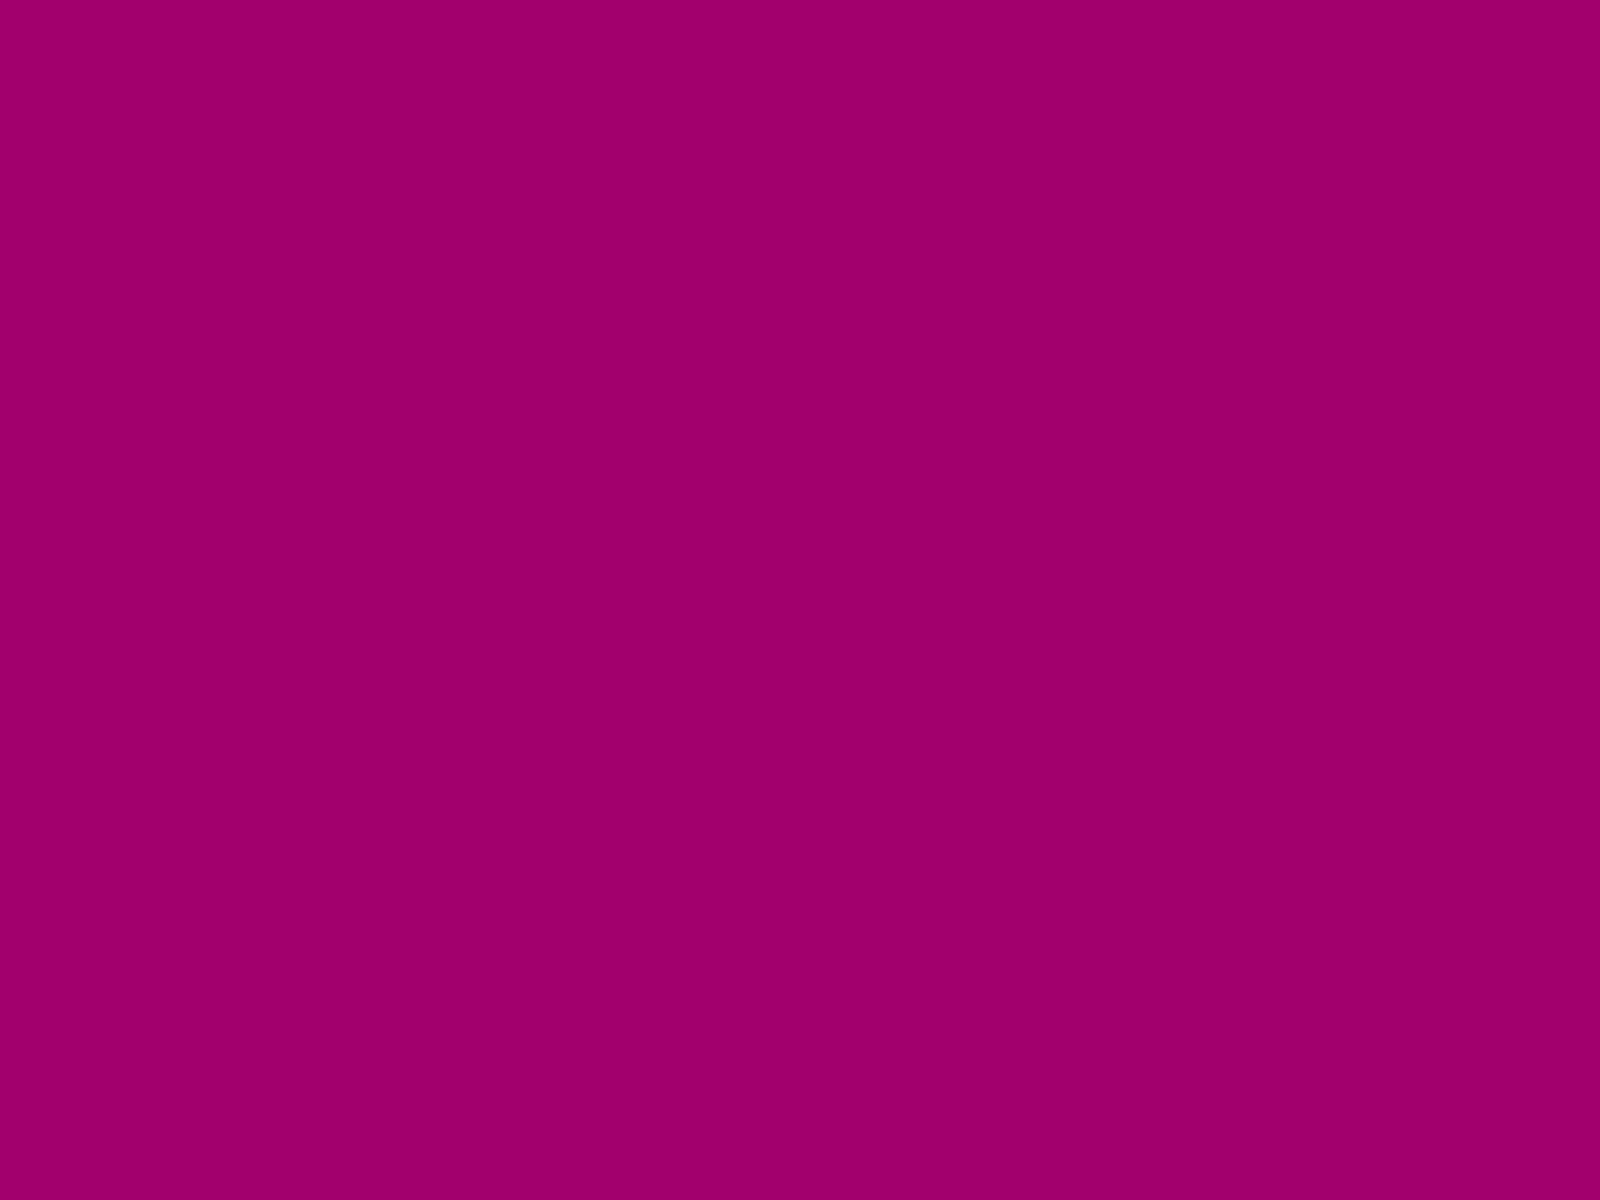 1600x1200 Flirt Solid Color Background